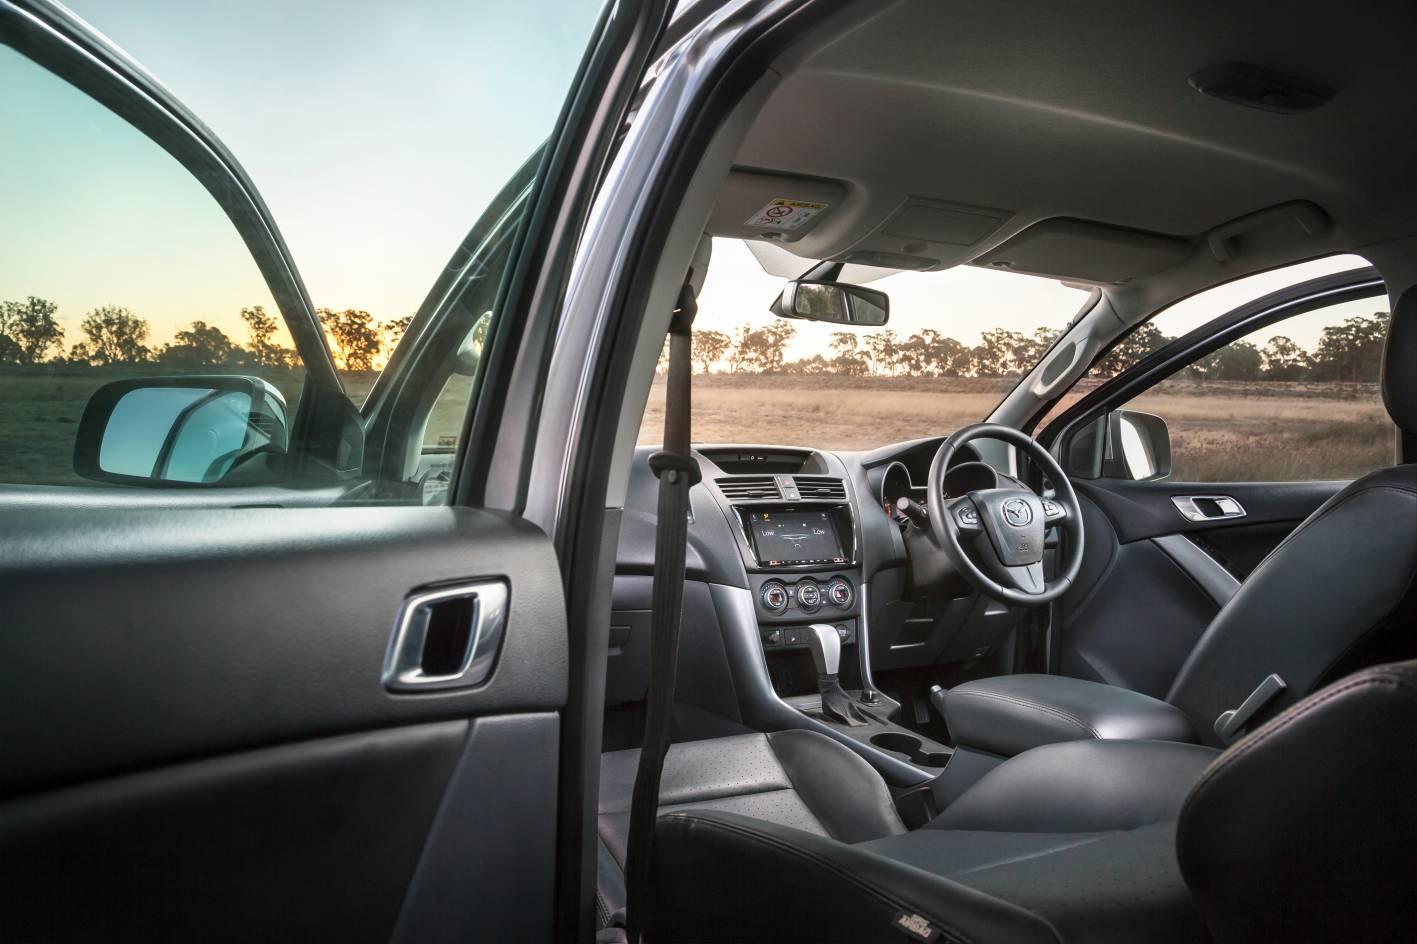 2018 Mazda BT-50 05.jpg